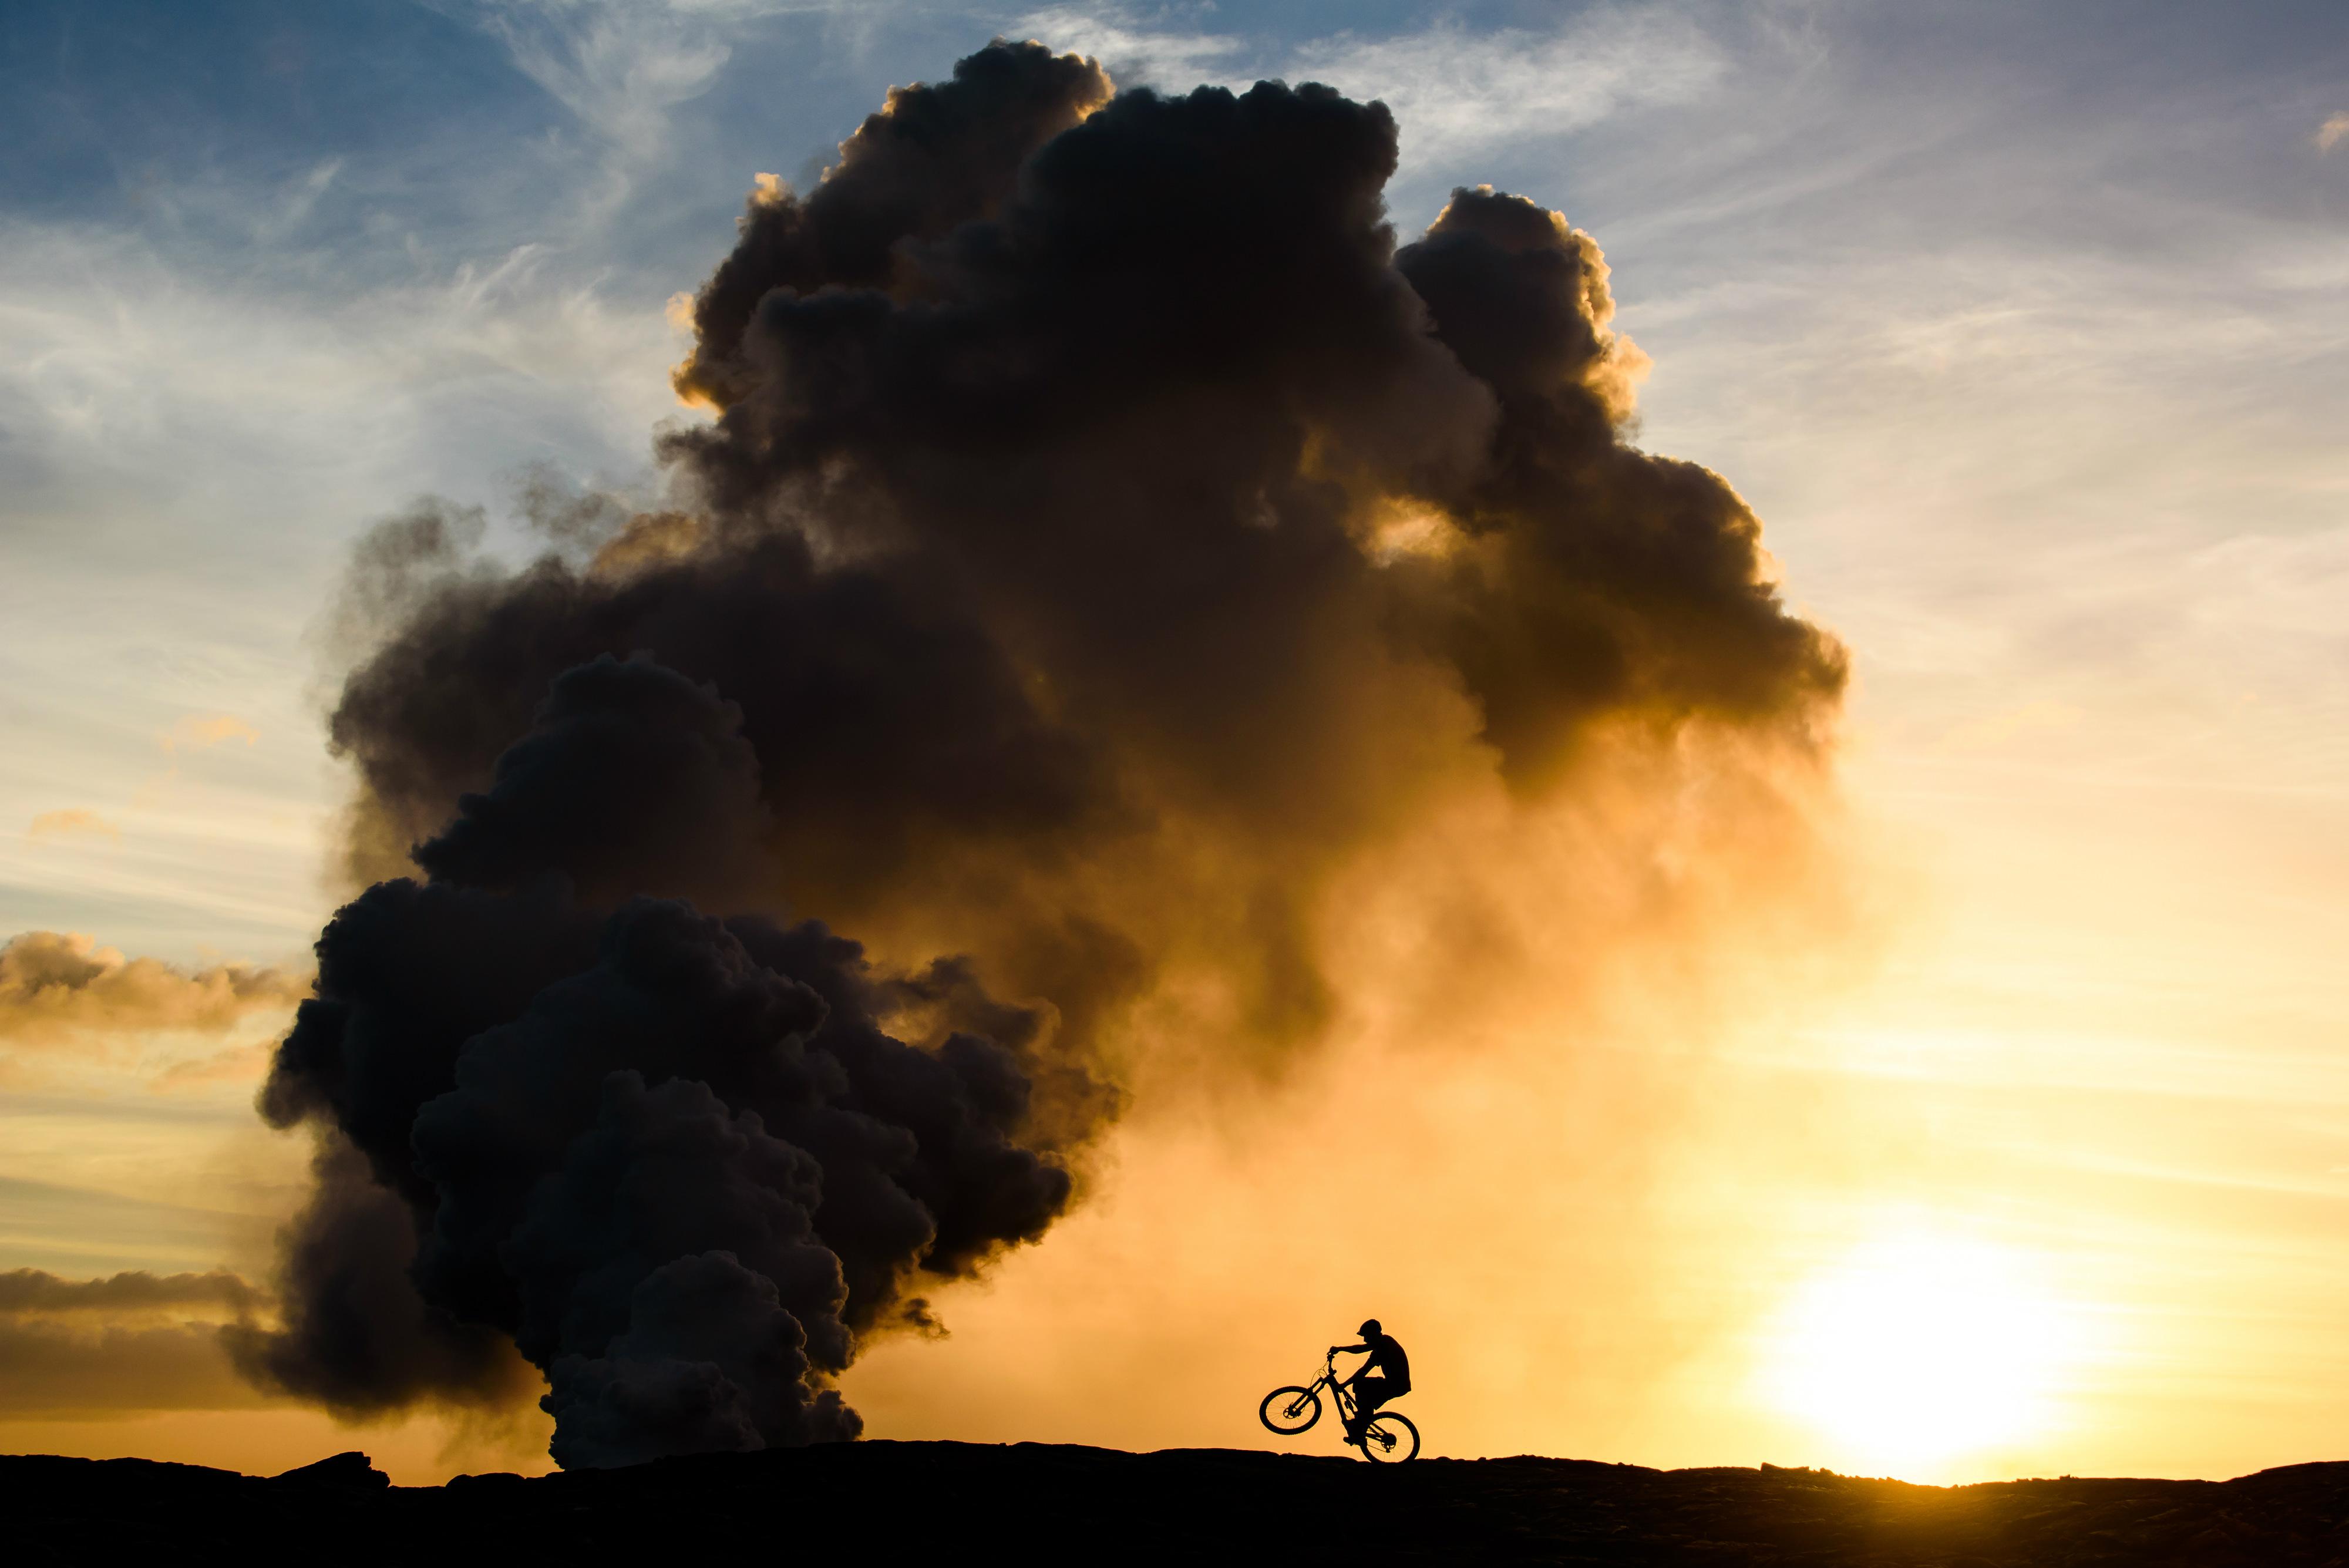 explosive silhouette